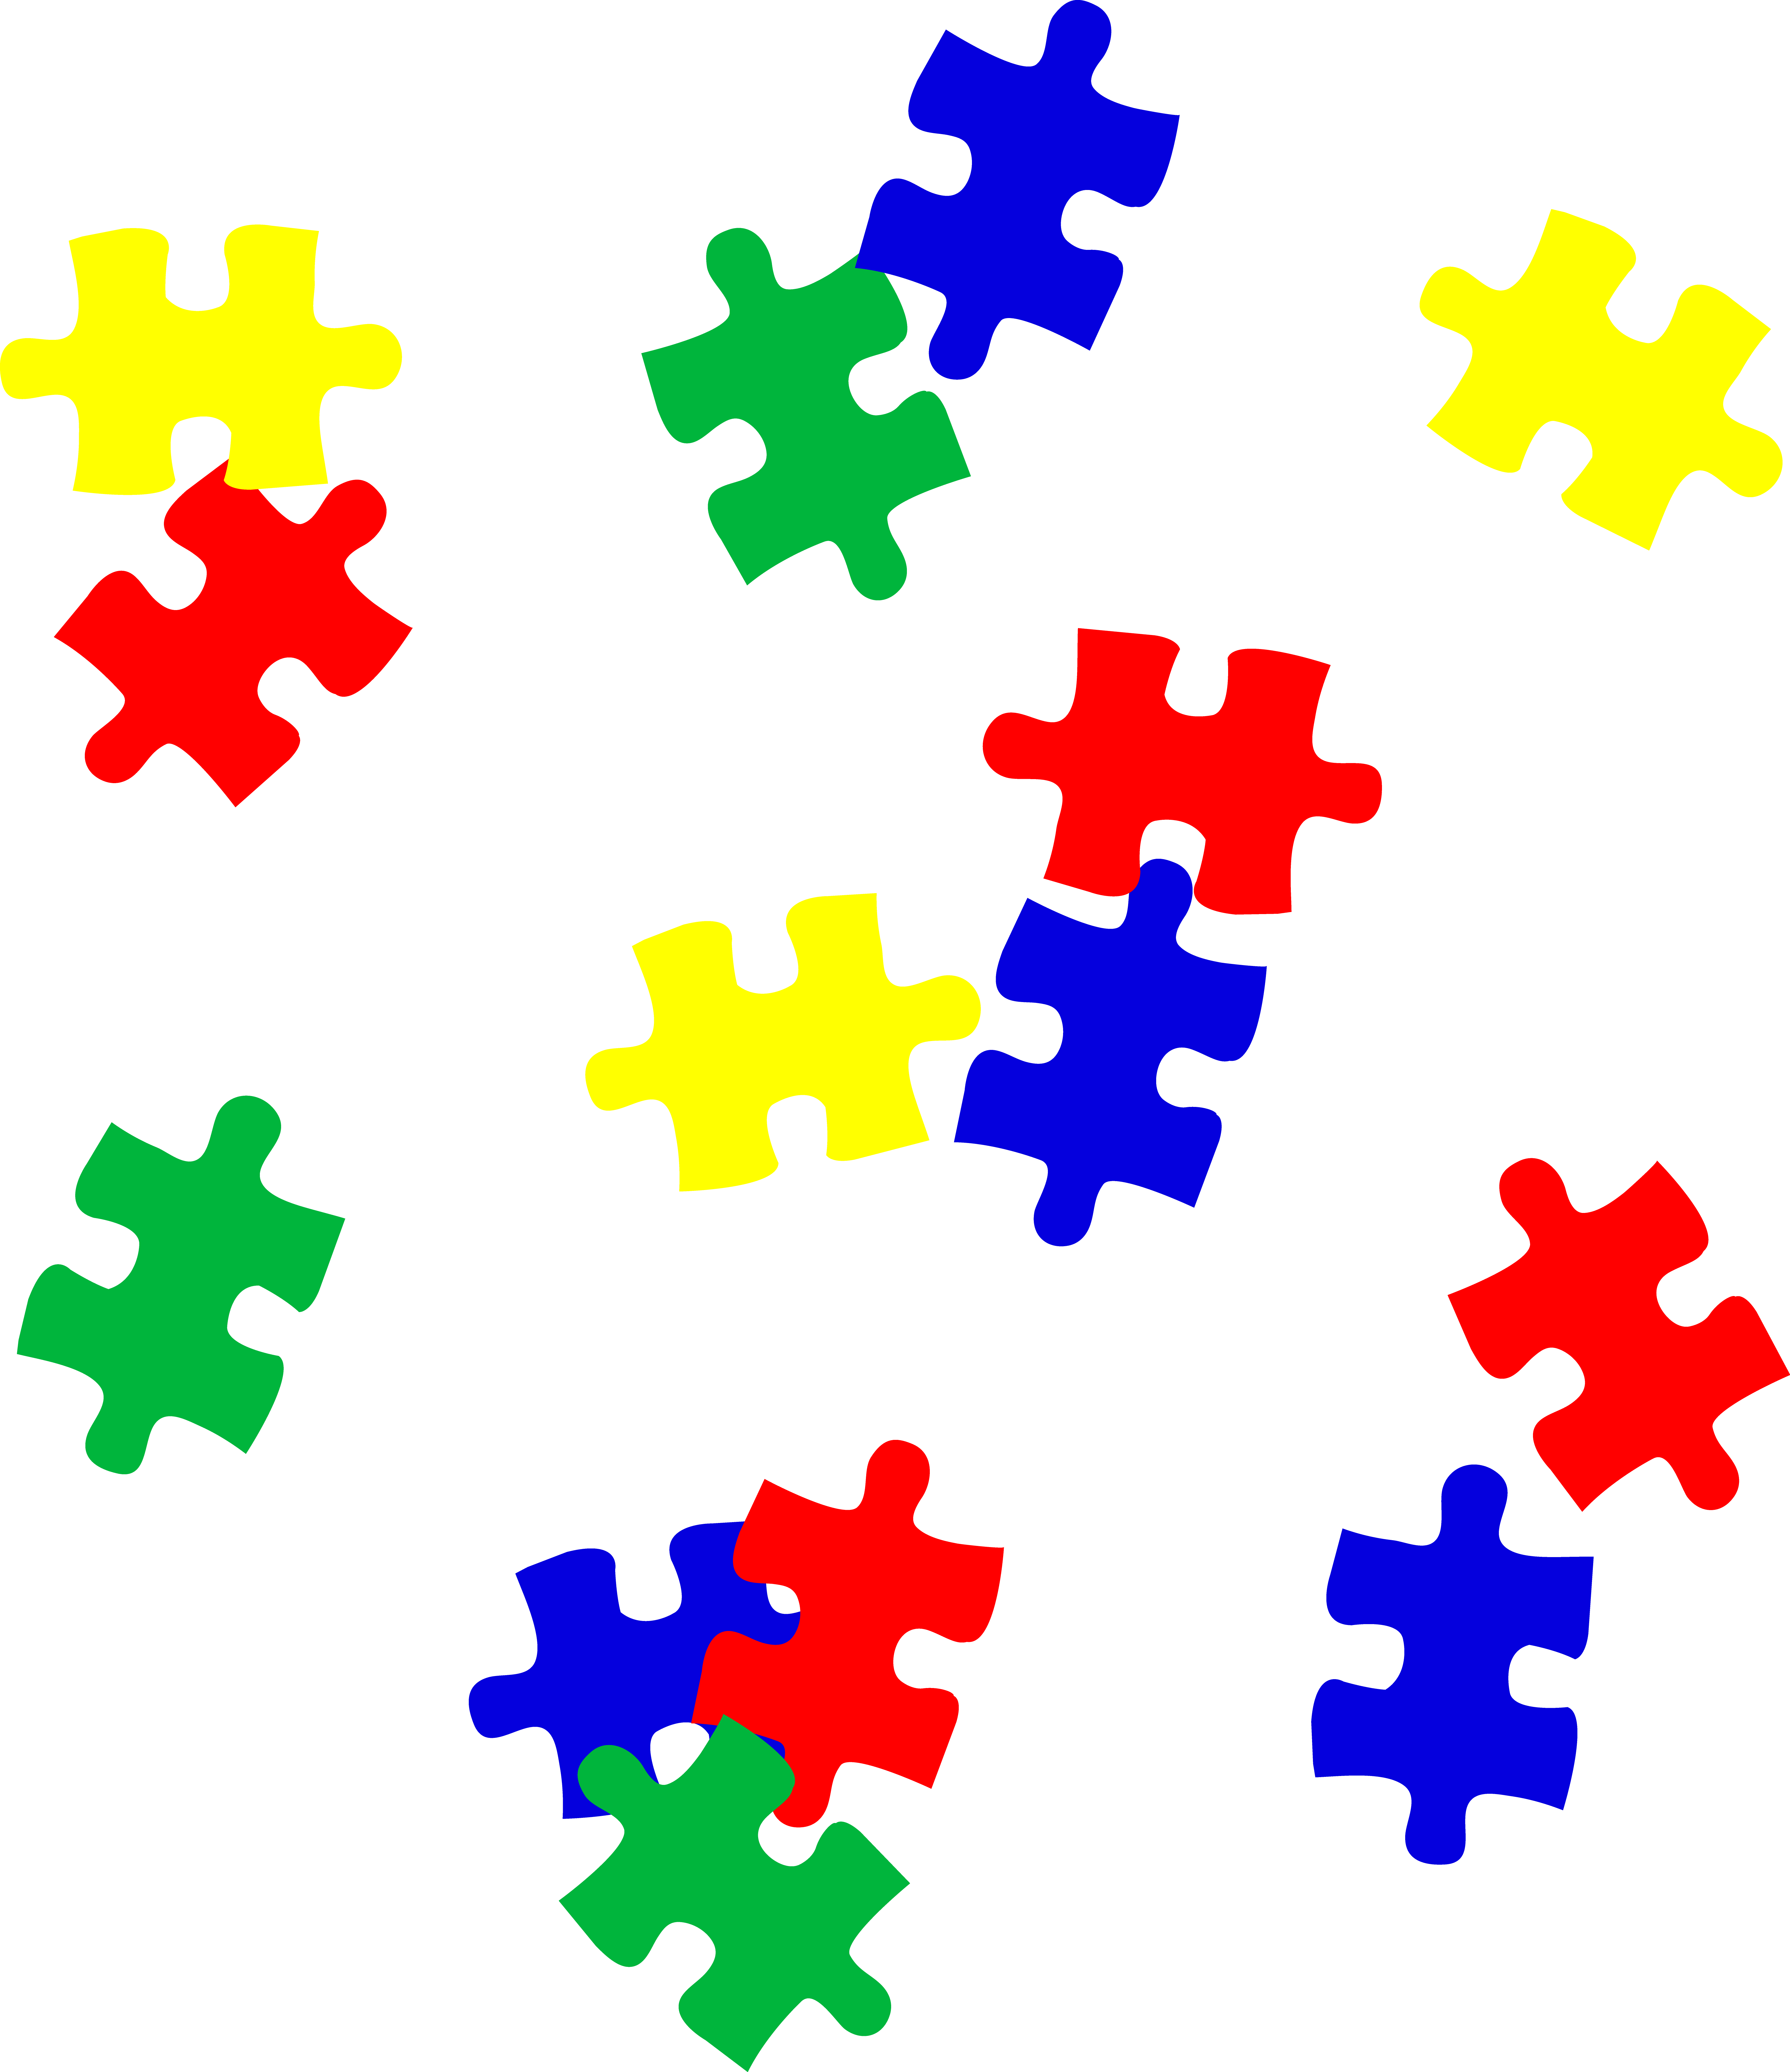 Puzzle Clip Art Free